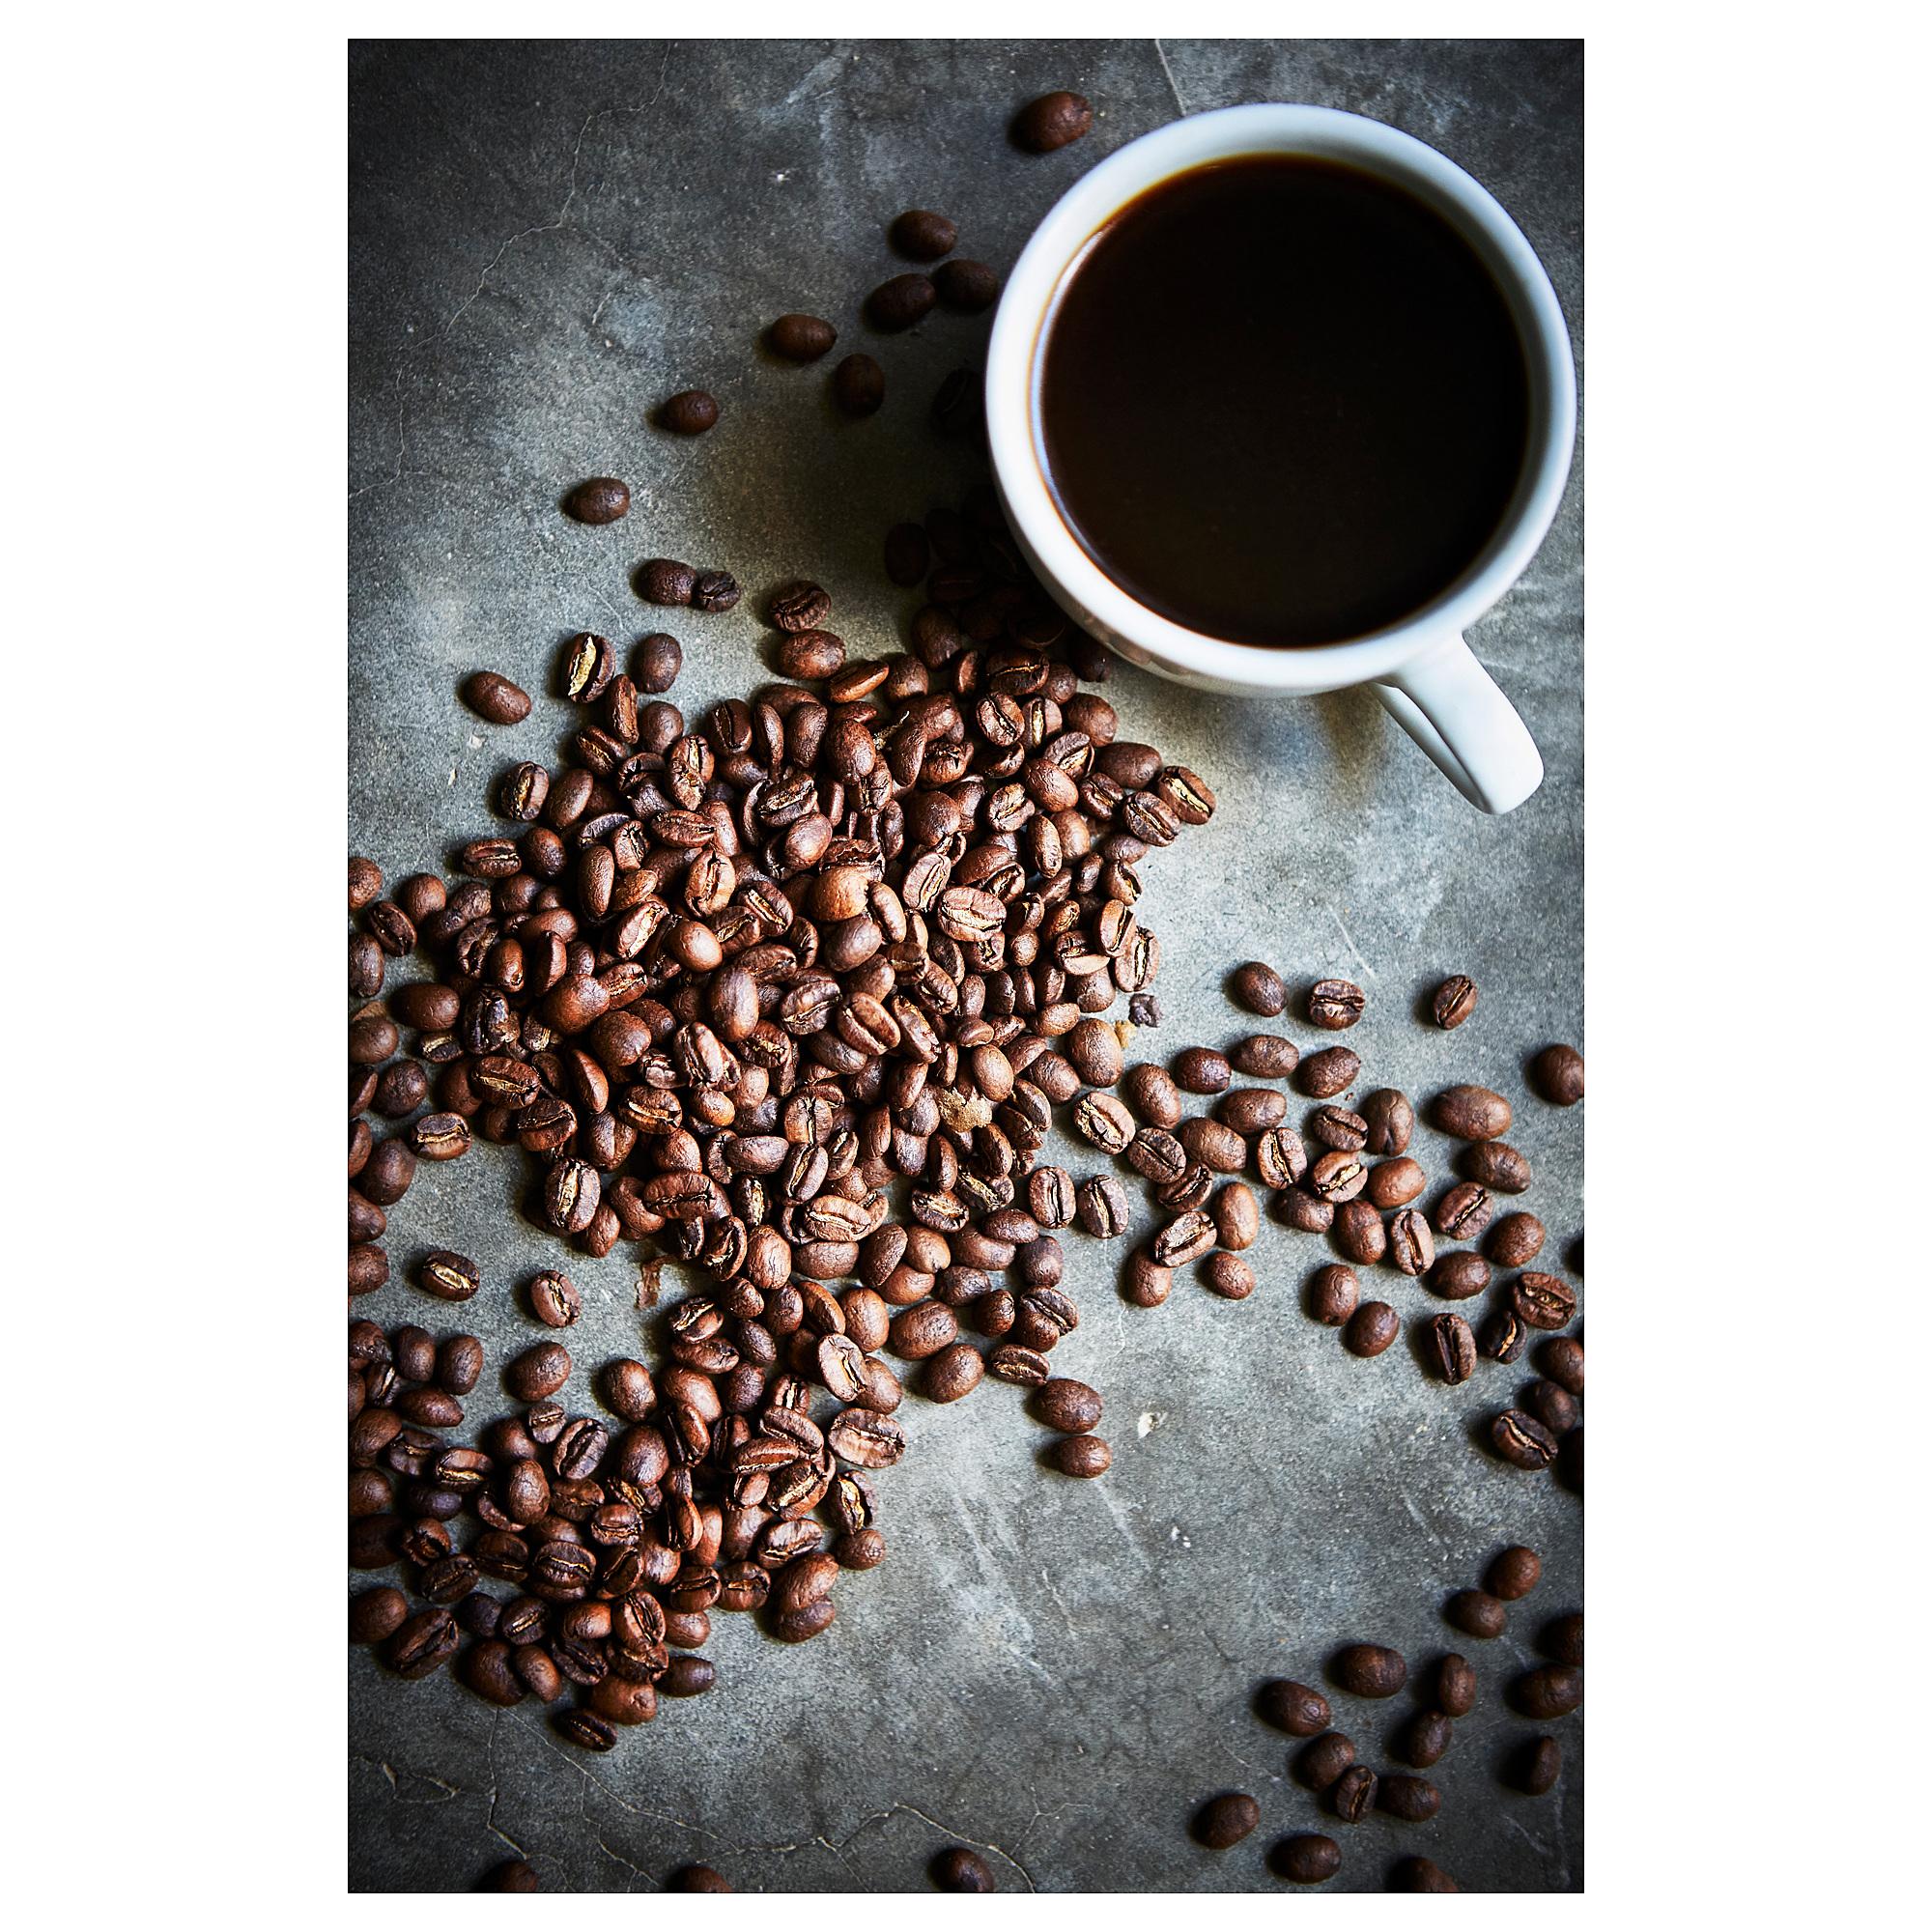 PÅTÅR signature coffee, beans